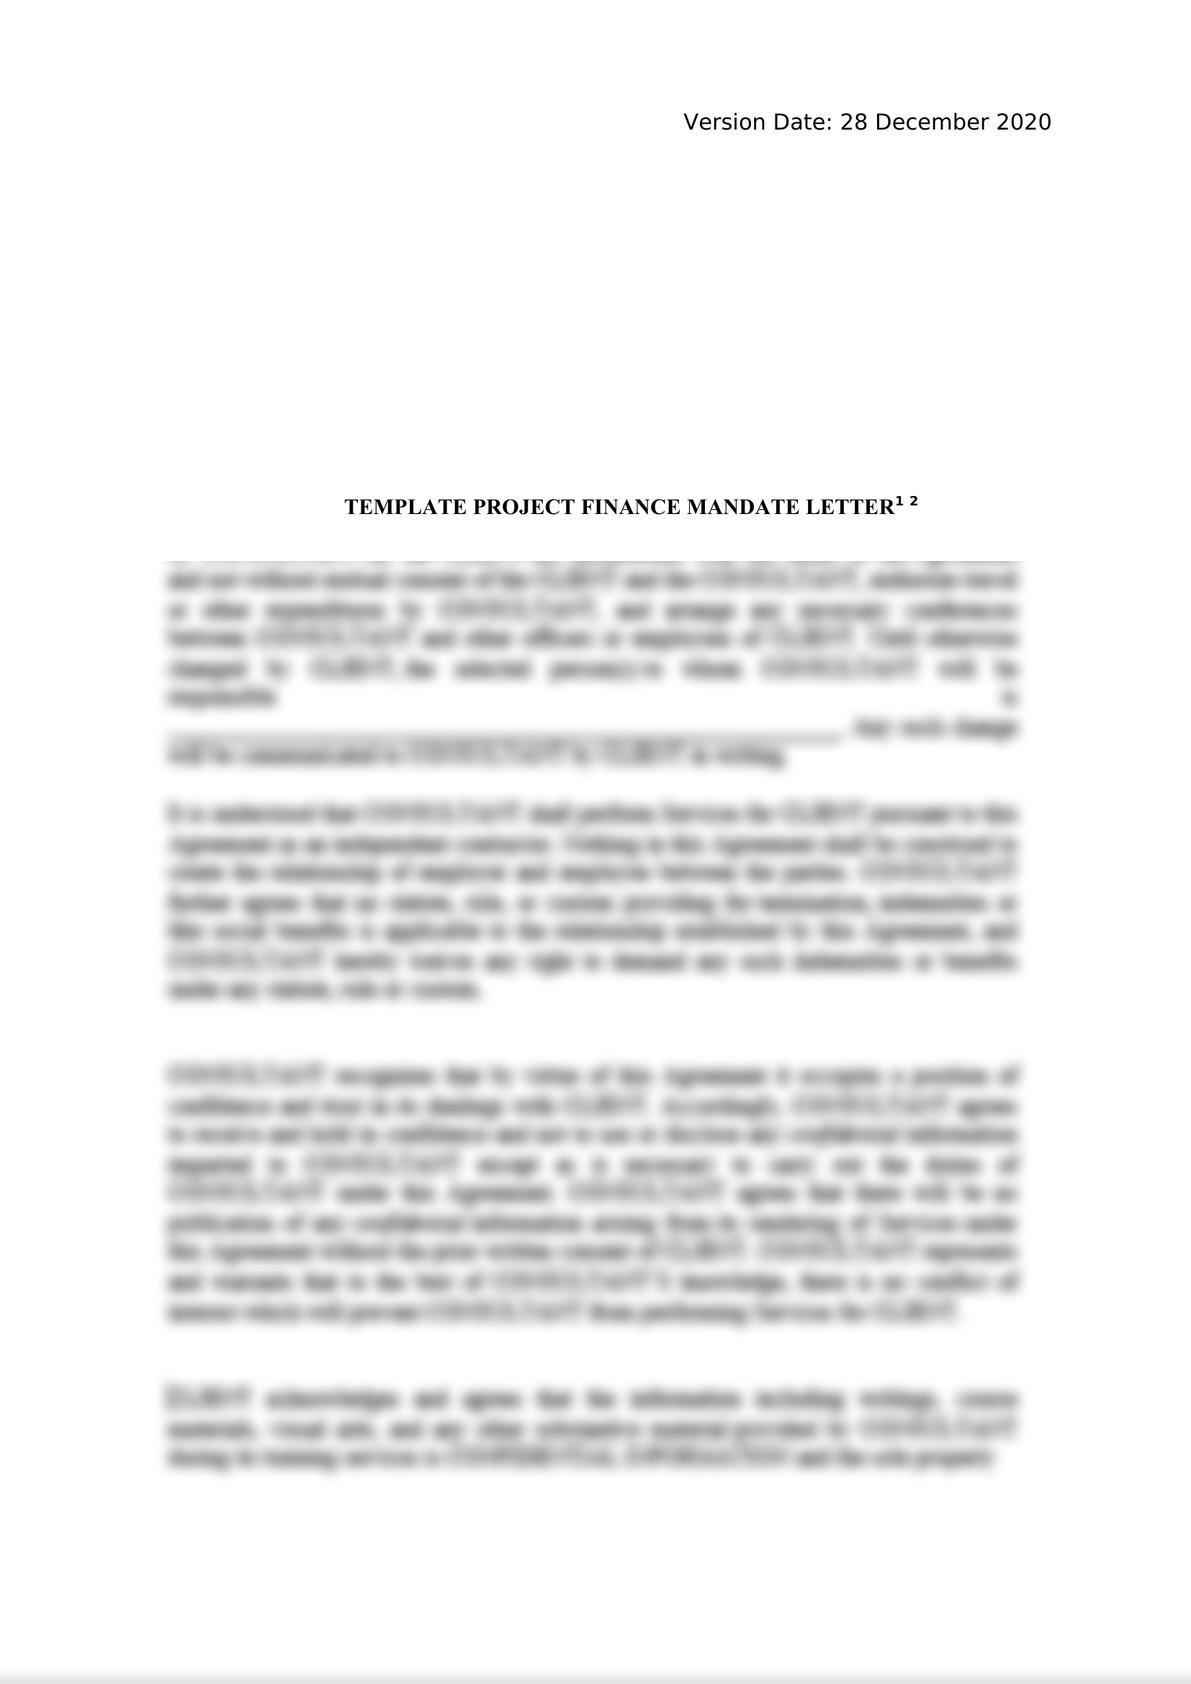 Template Project Finance Mandate Letter-0